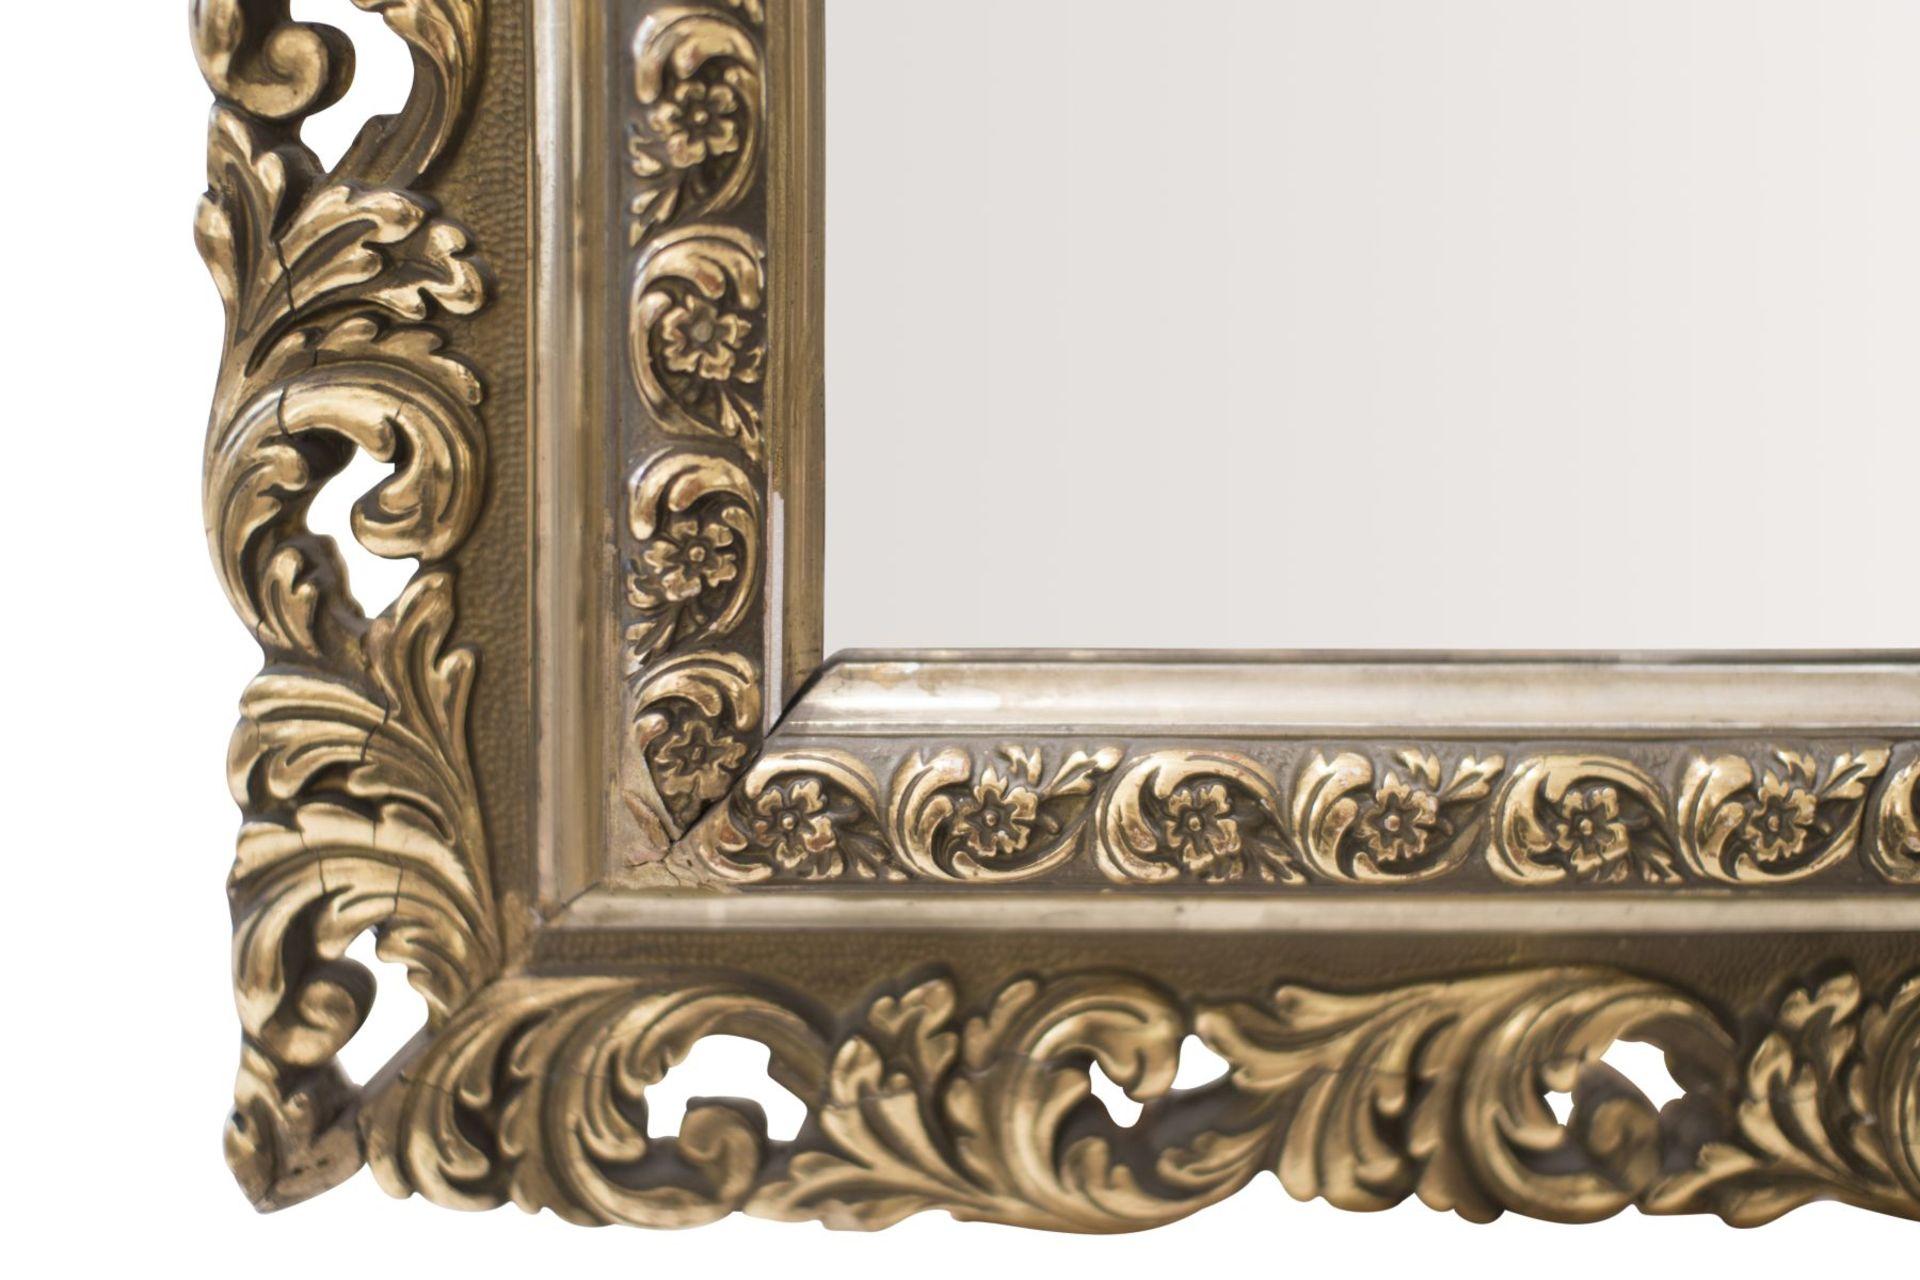 Decorative mirror - Image 4 of 5